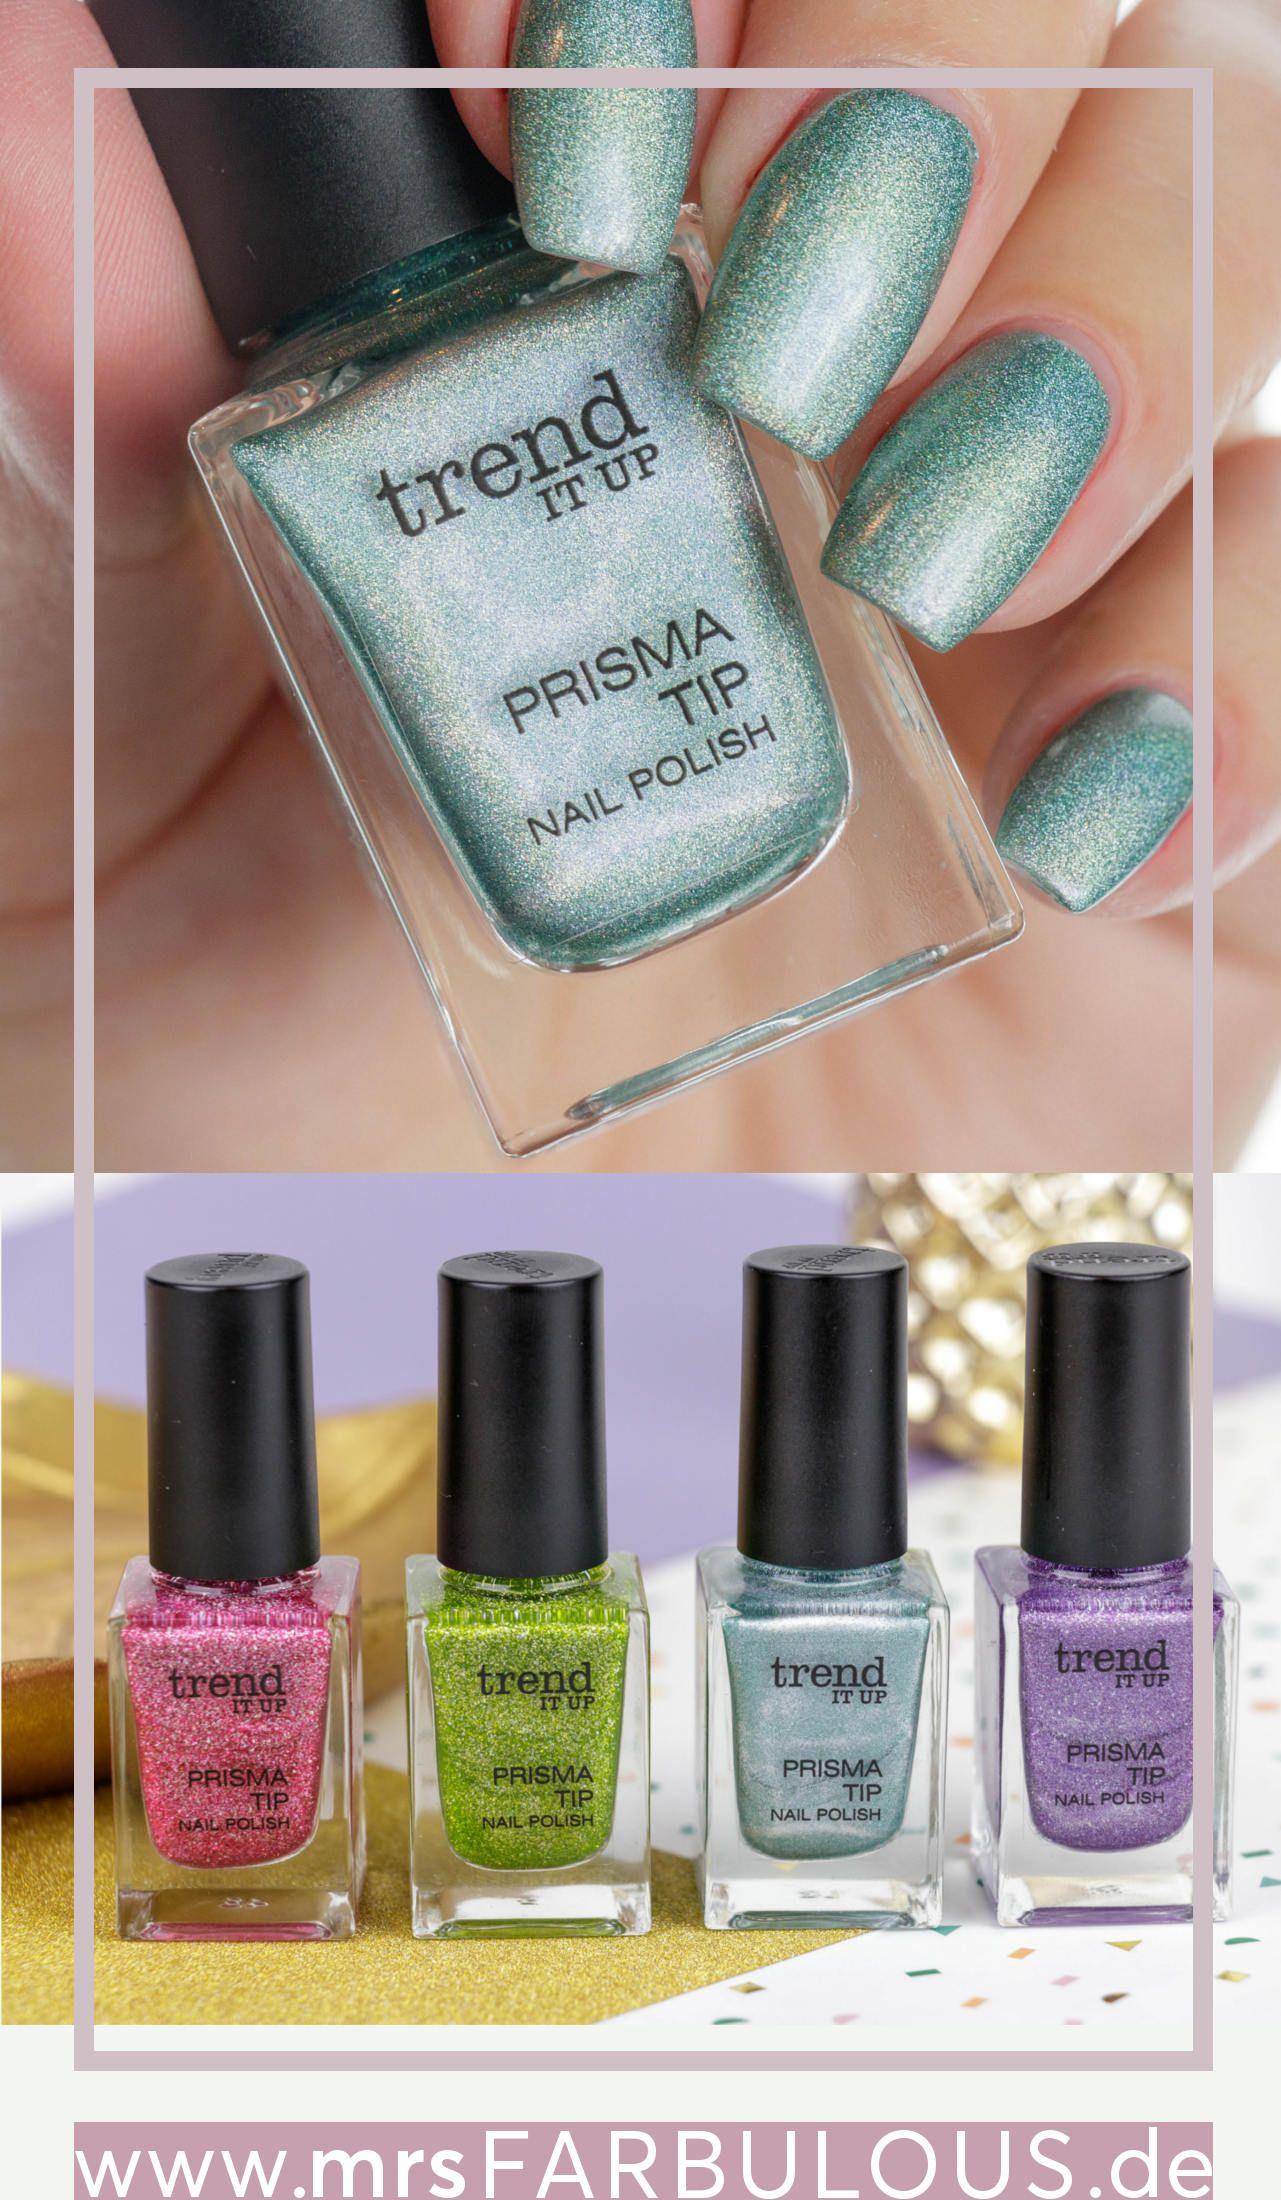 Trend it up prisma tip nagellack tragebilder nails - Nagellack designs ...